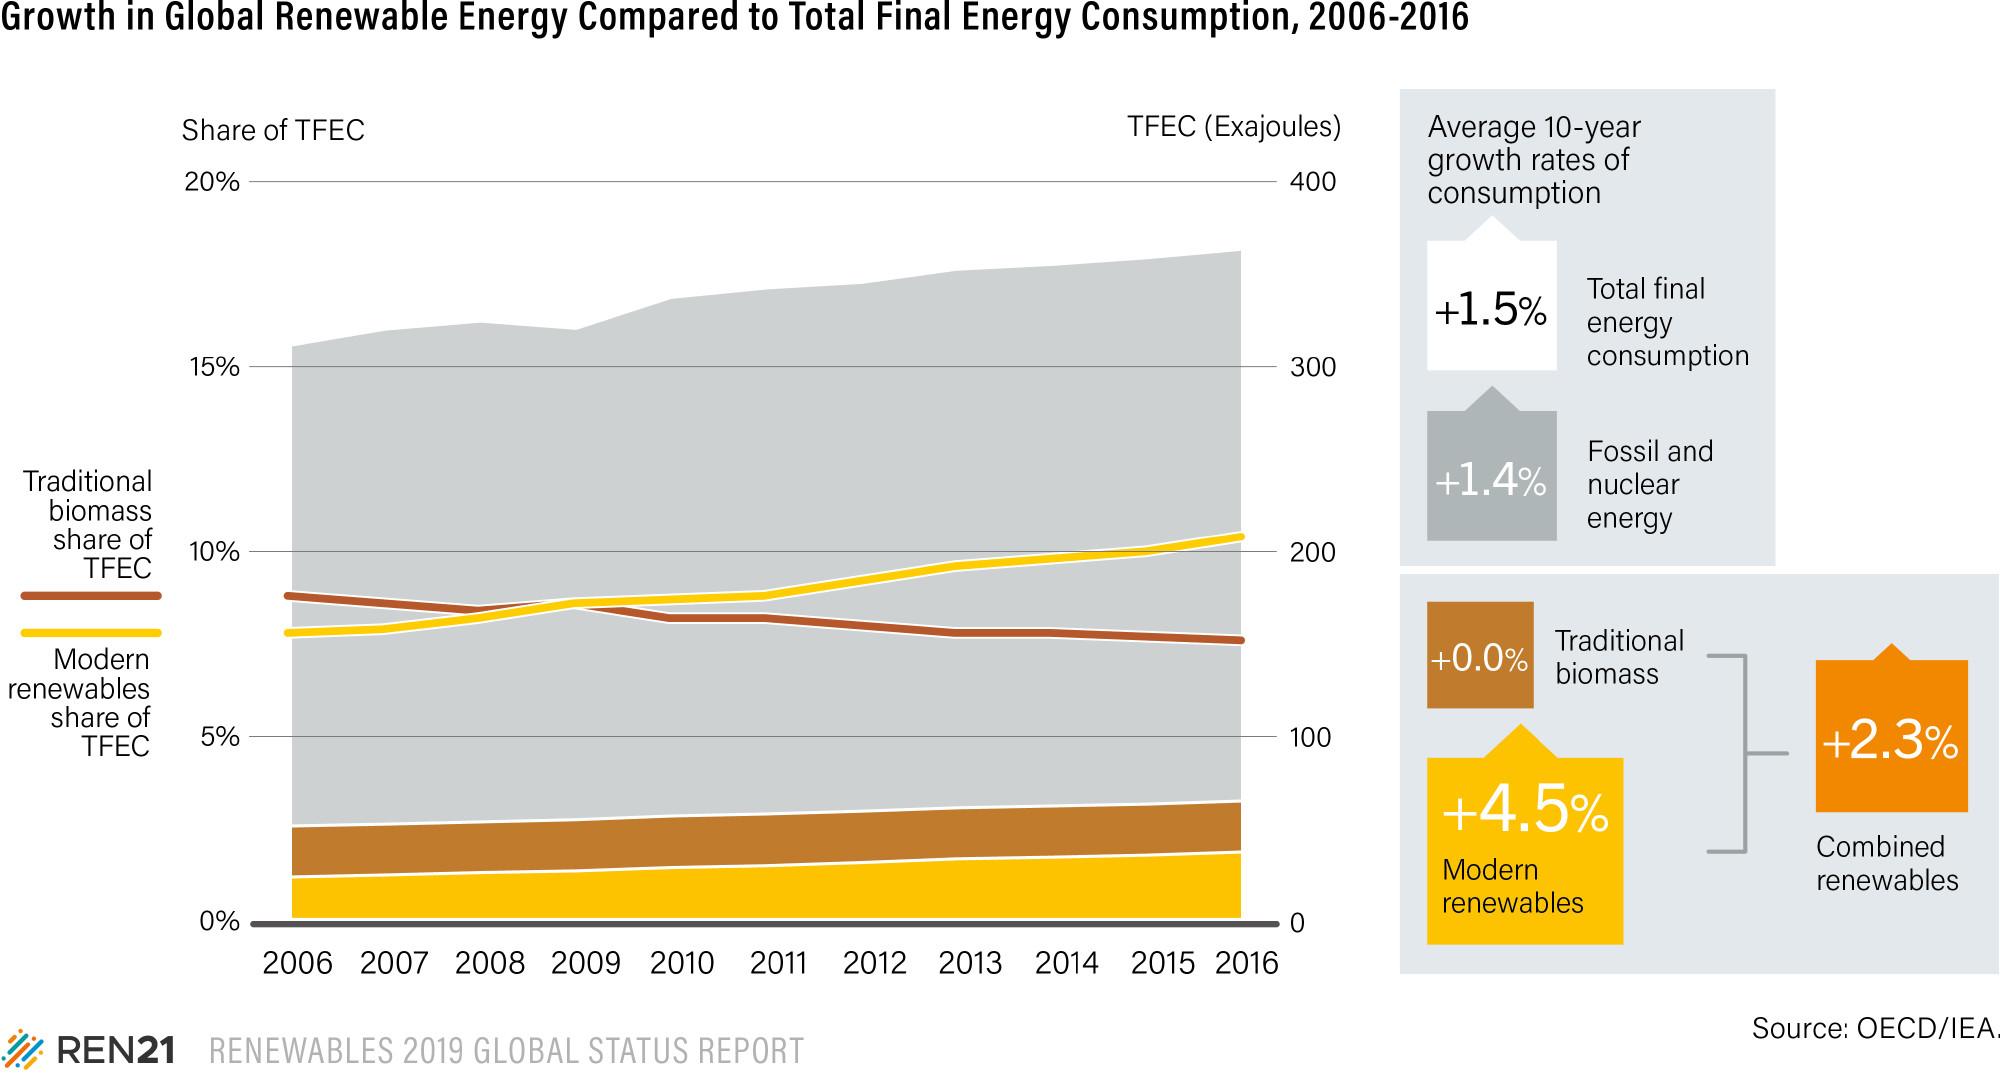 Global growth in renewable energy